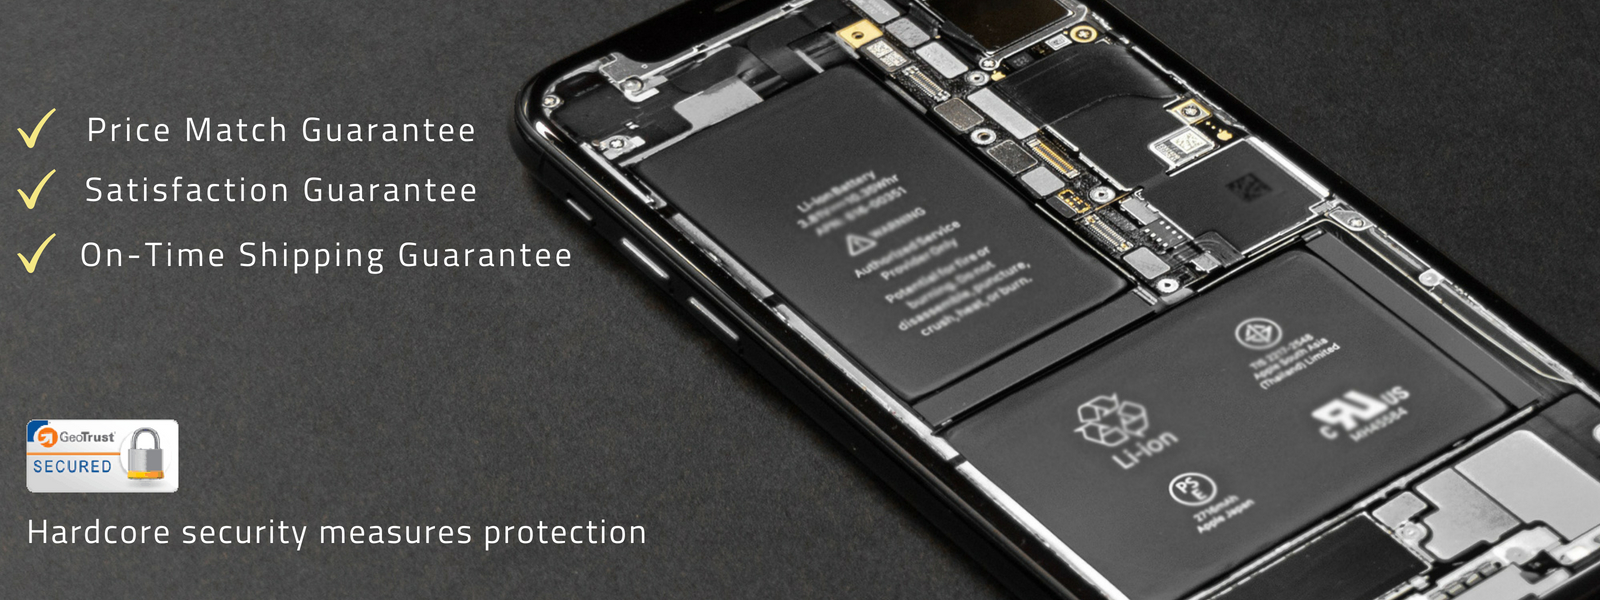 Parts4repair Professional Mobile Cell Phone Repair Parts Online Htc Desire S Circuit Diagram 1